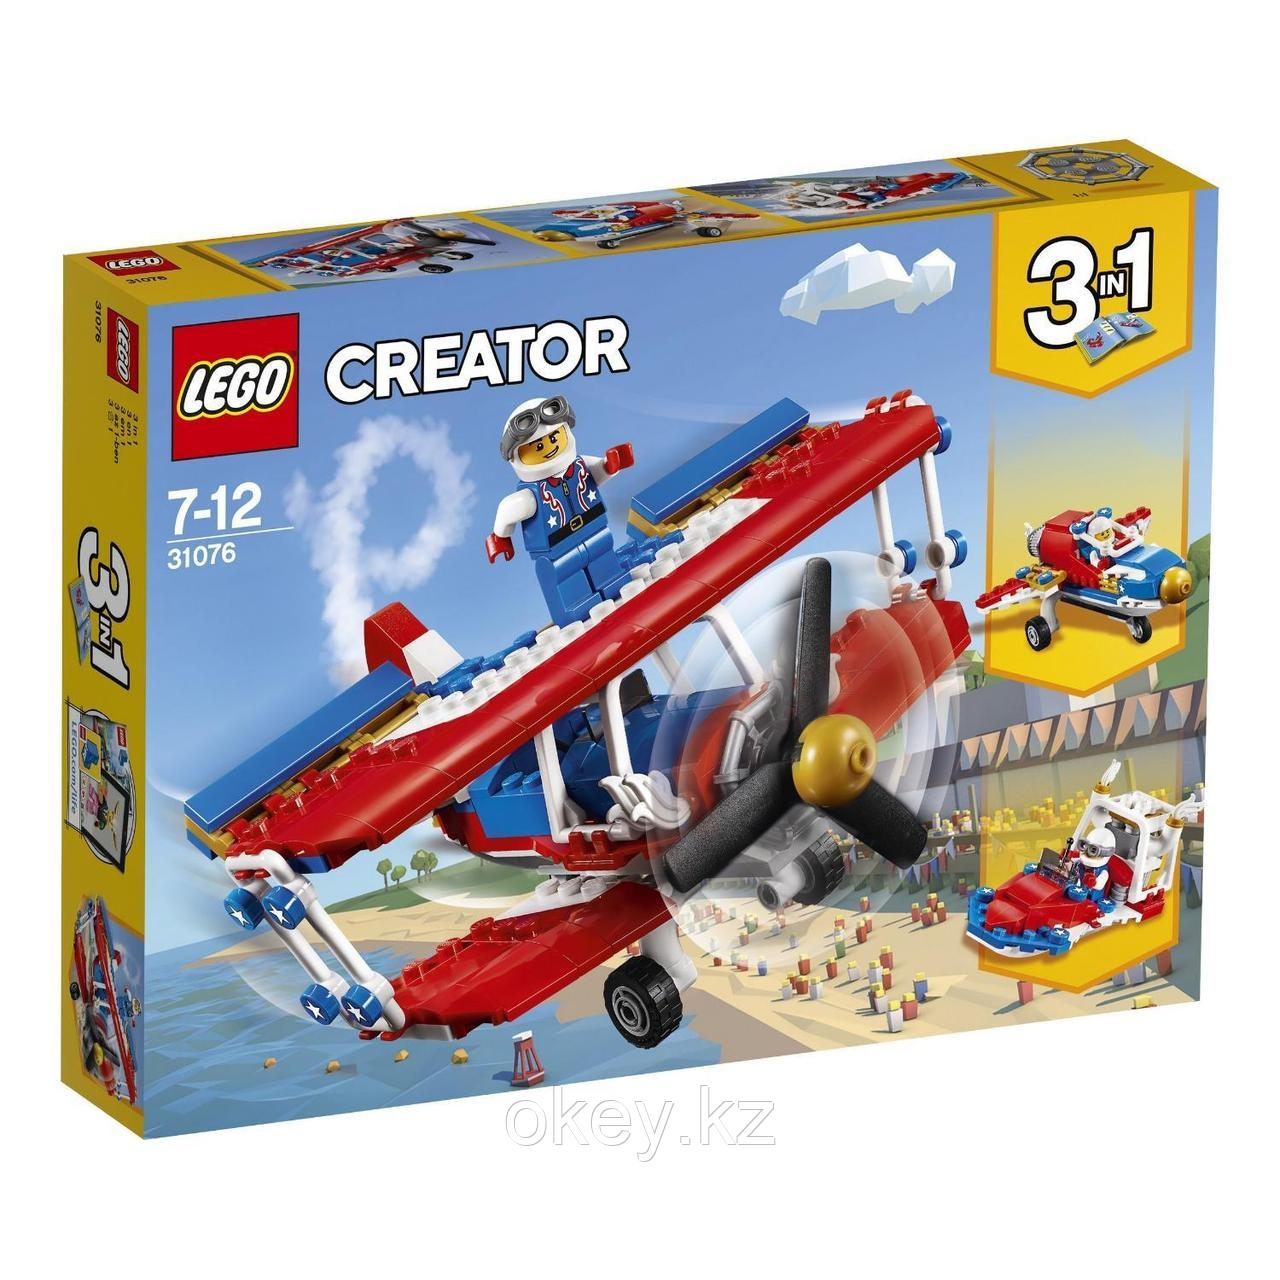 LEGO Creator: Самолёт для крутых трюков 31076